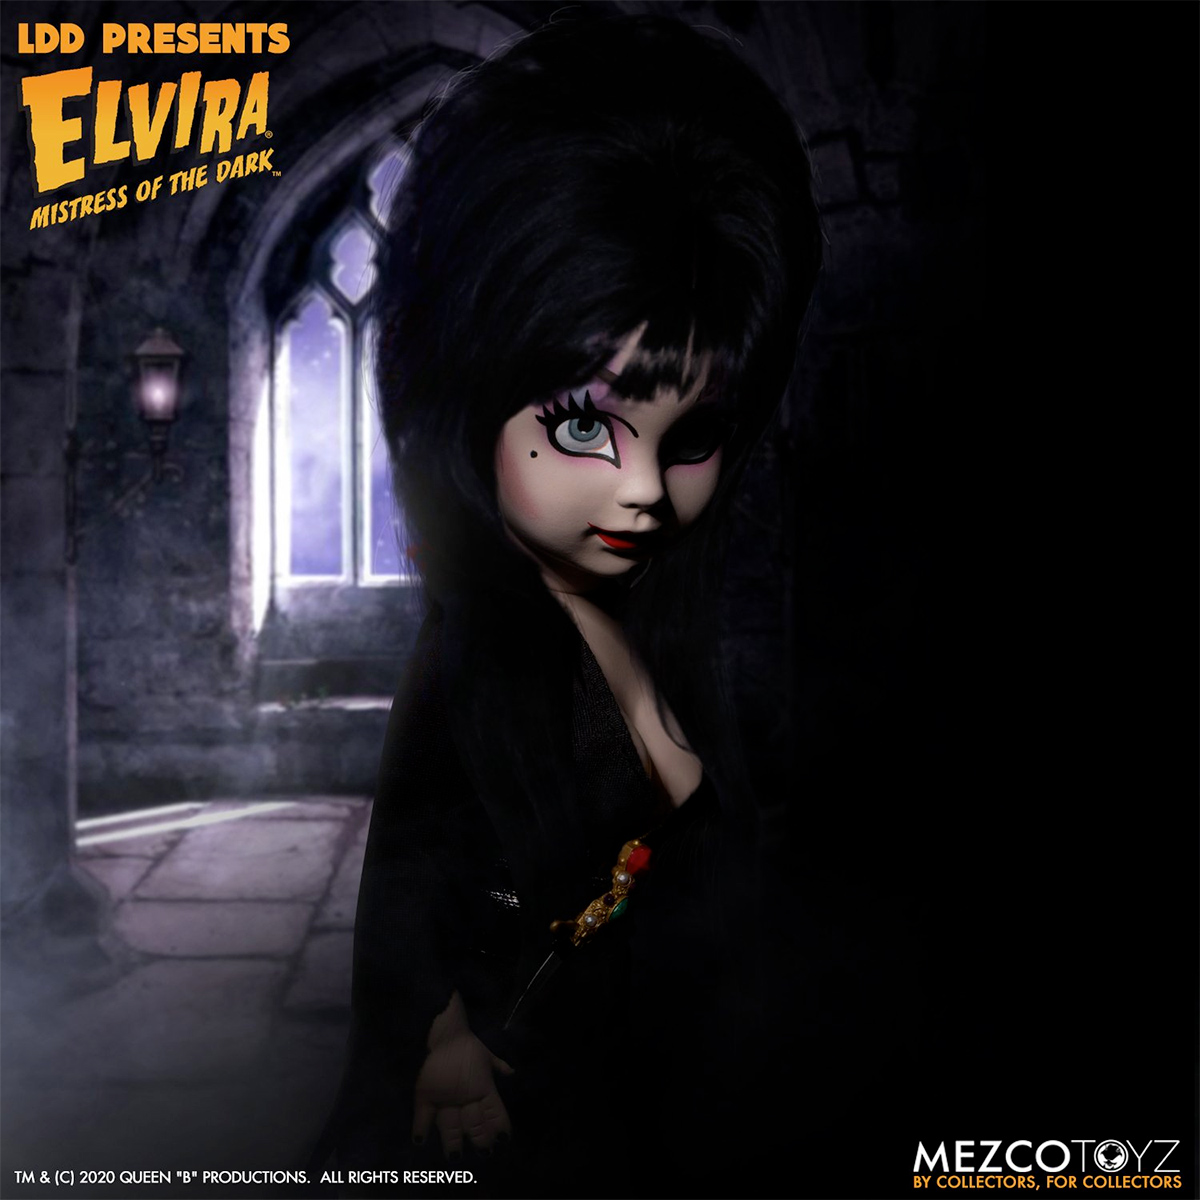 Boneca LDD Presents Elvira Mistress of the Dark